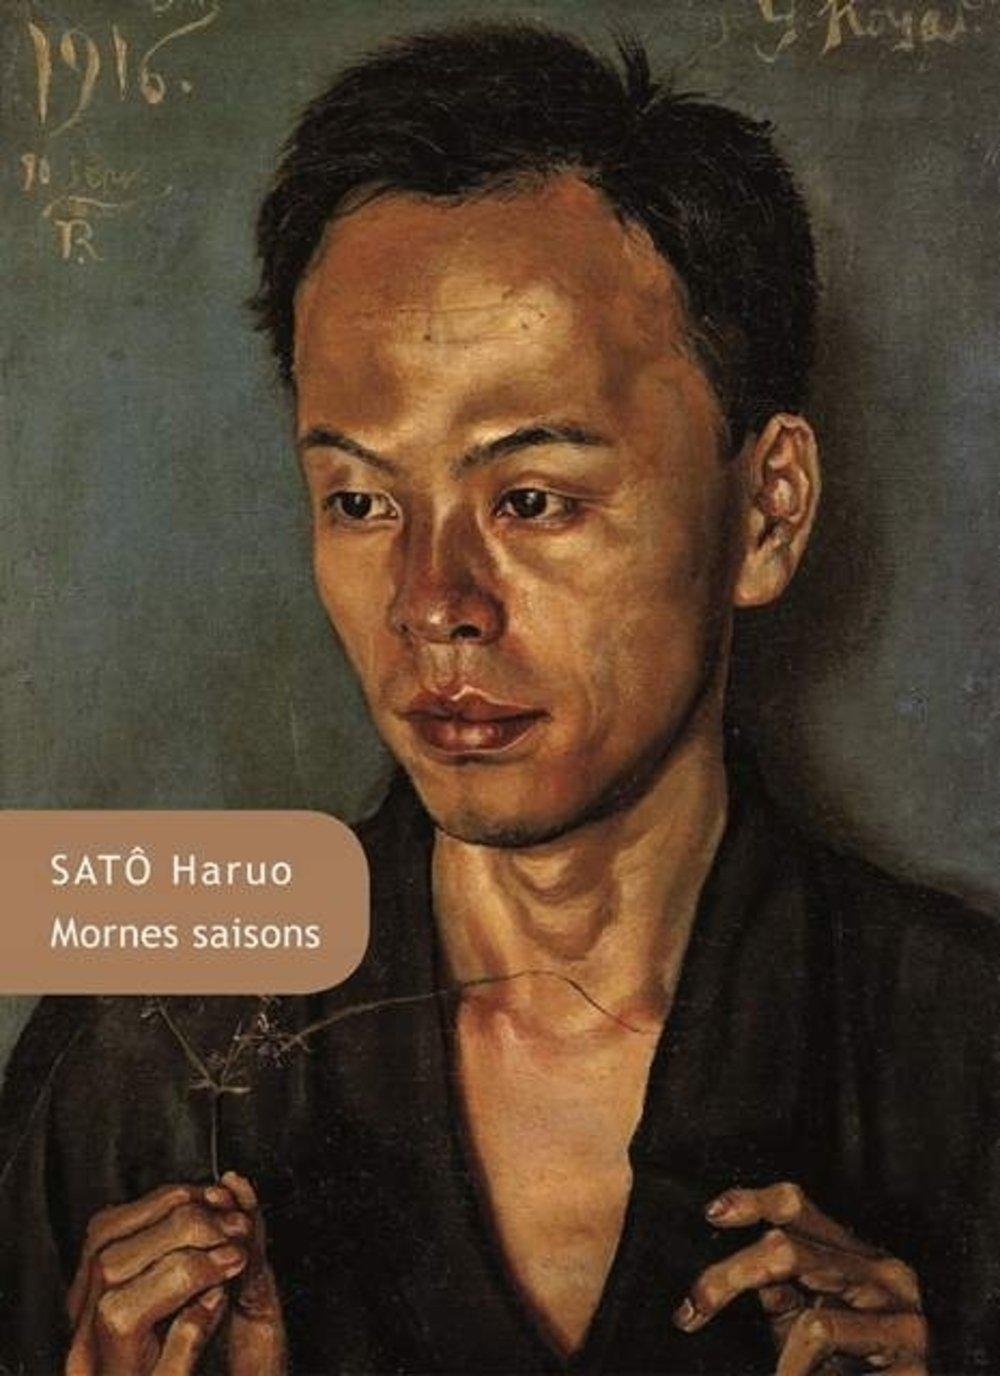 Mornes saisons de Haruo Sato